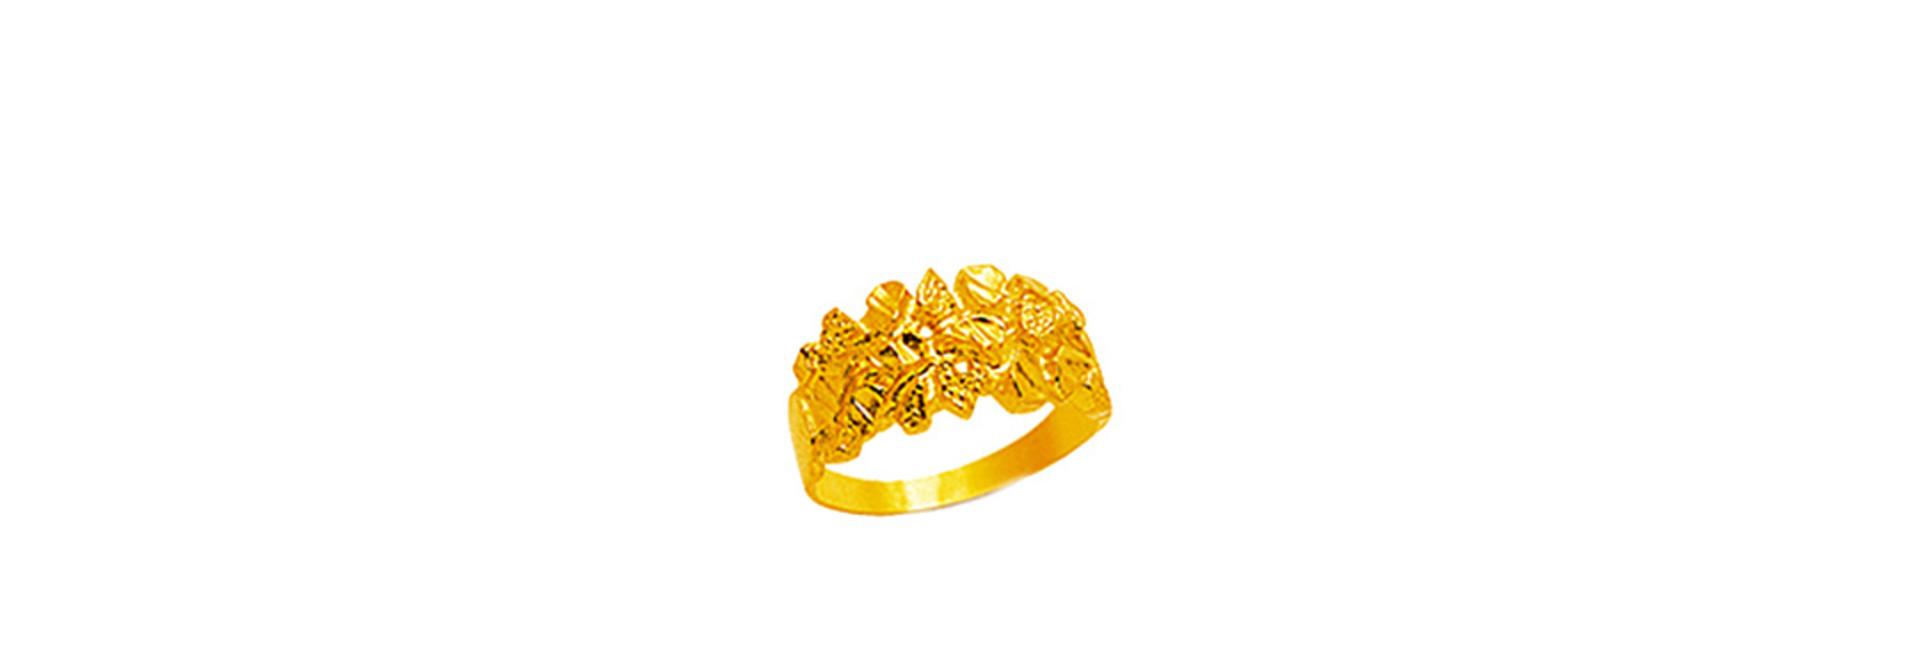 Piet piet ring